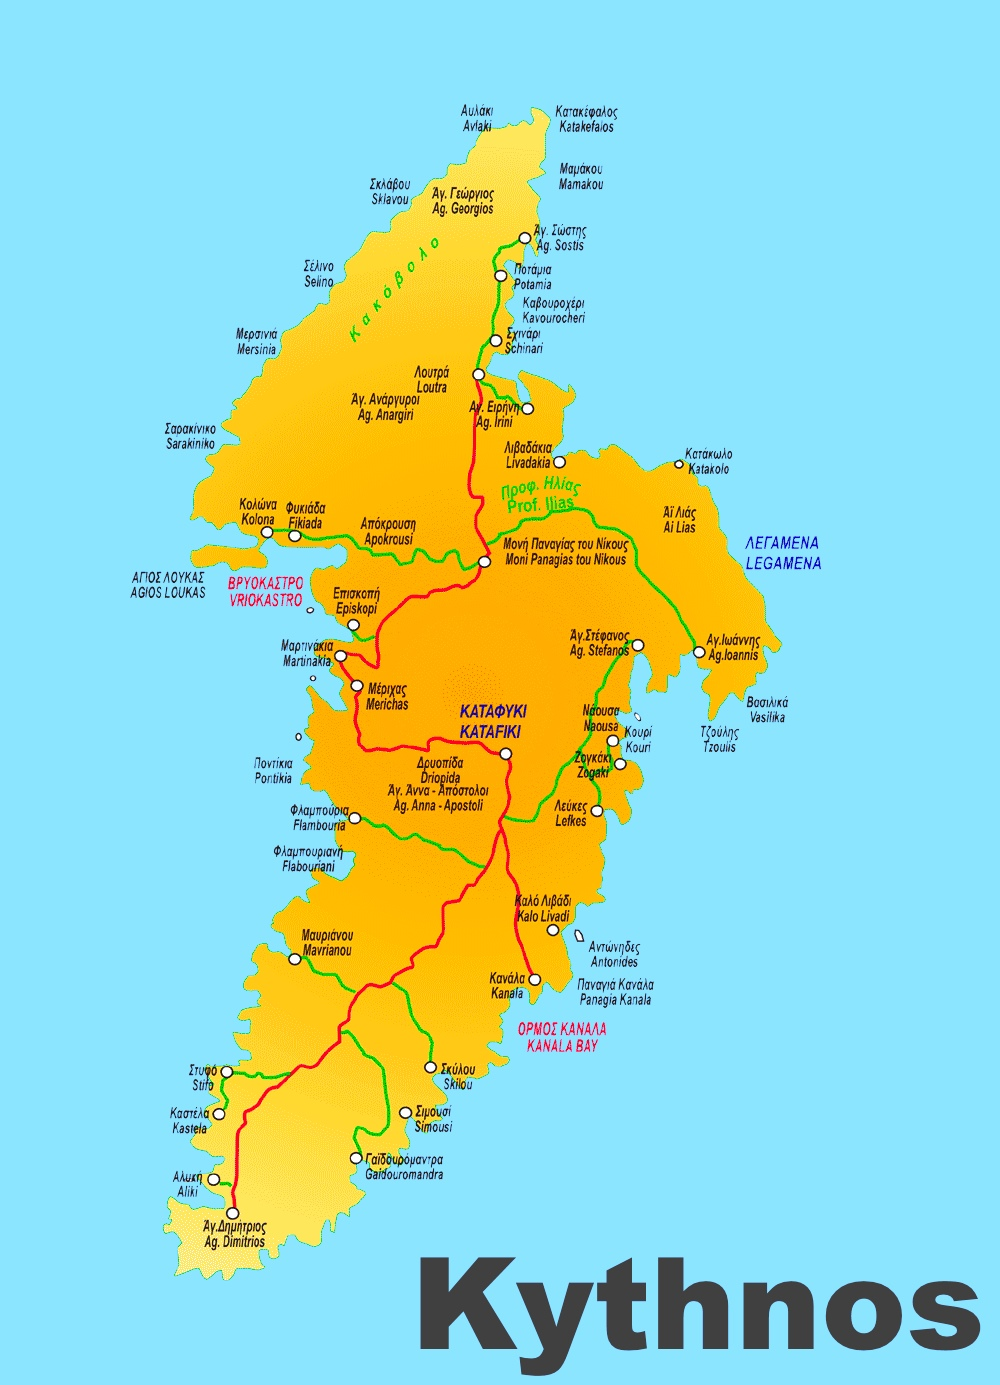 Kythnos tourist map